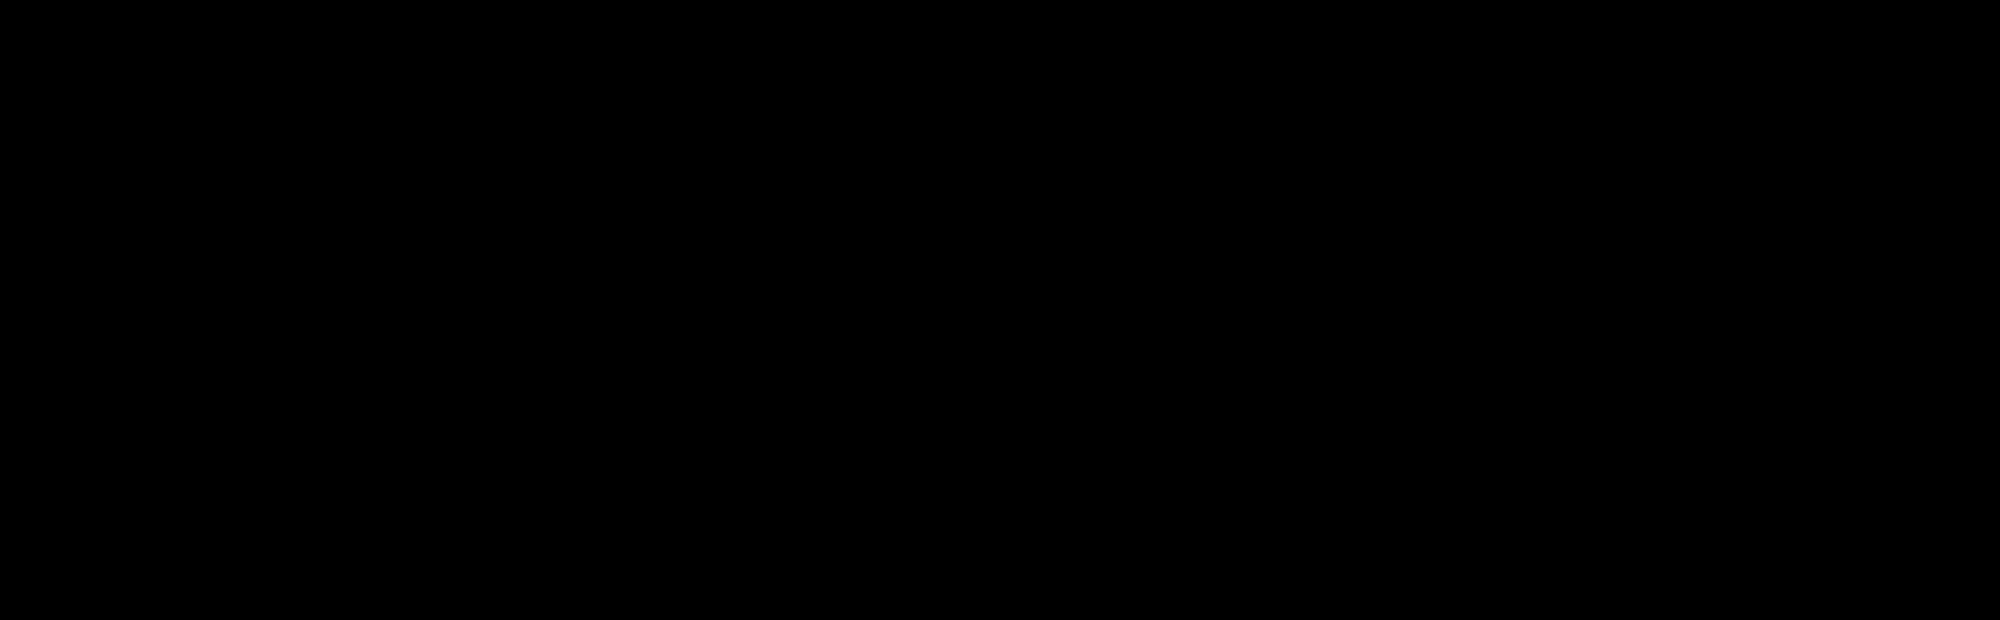 Zita Banyai's Signature